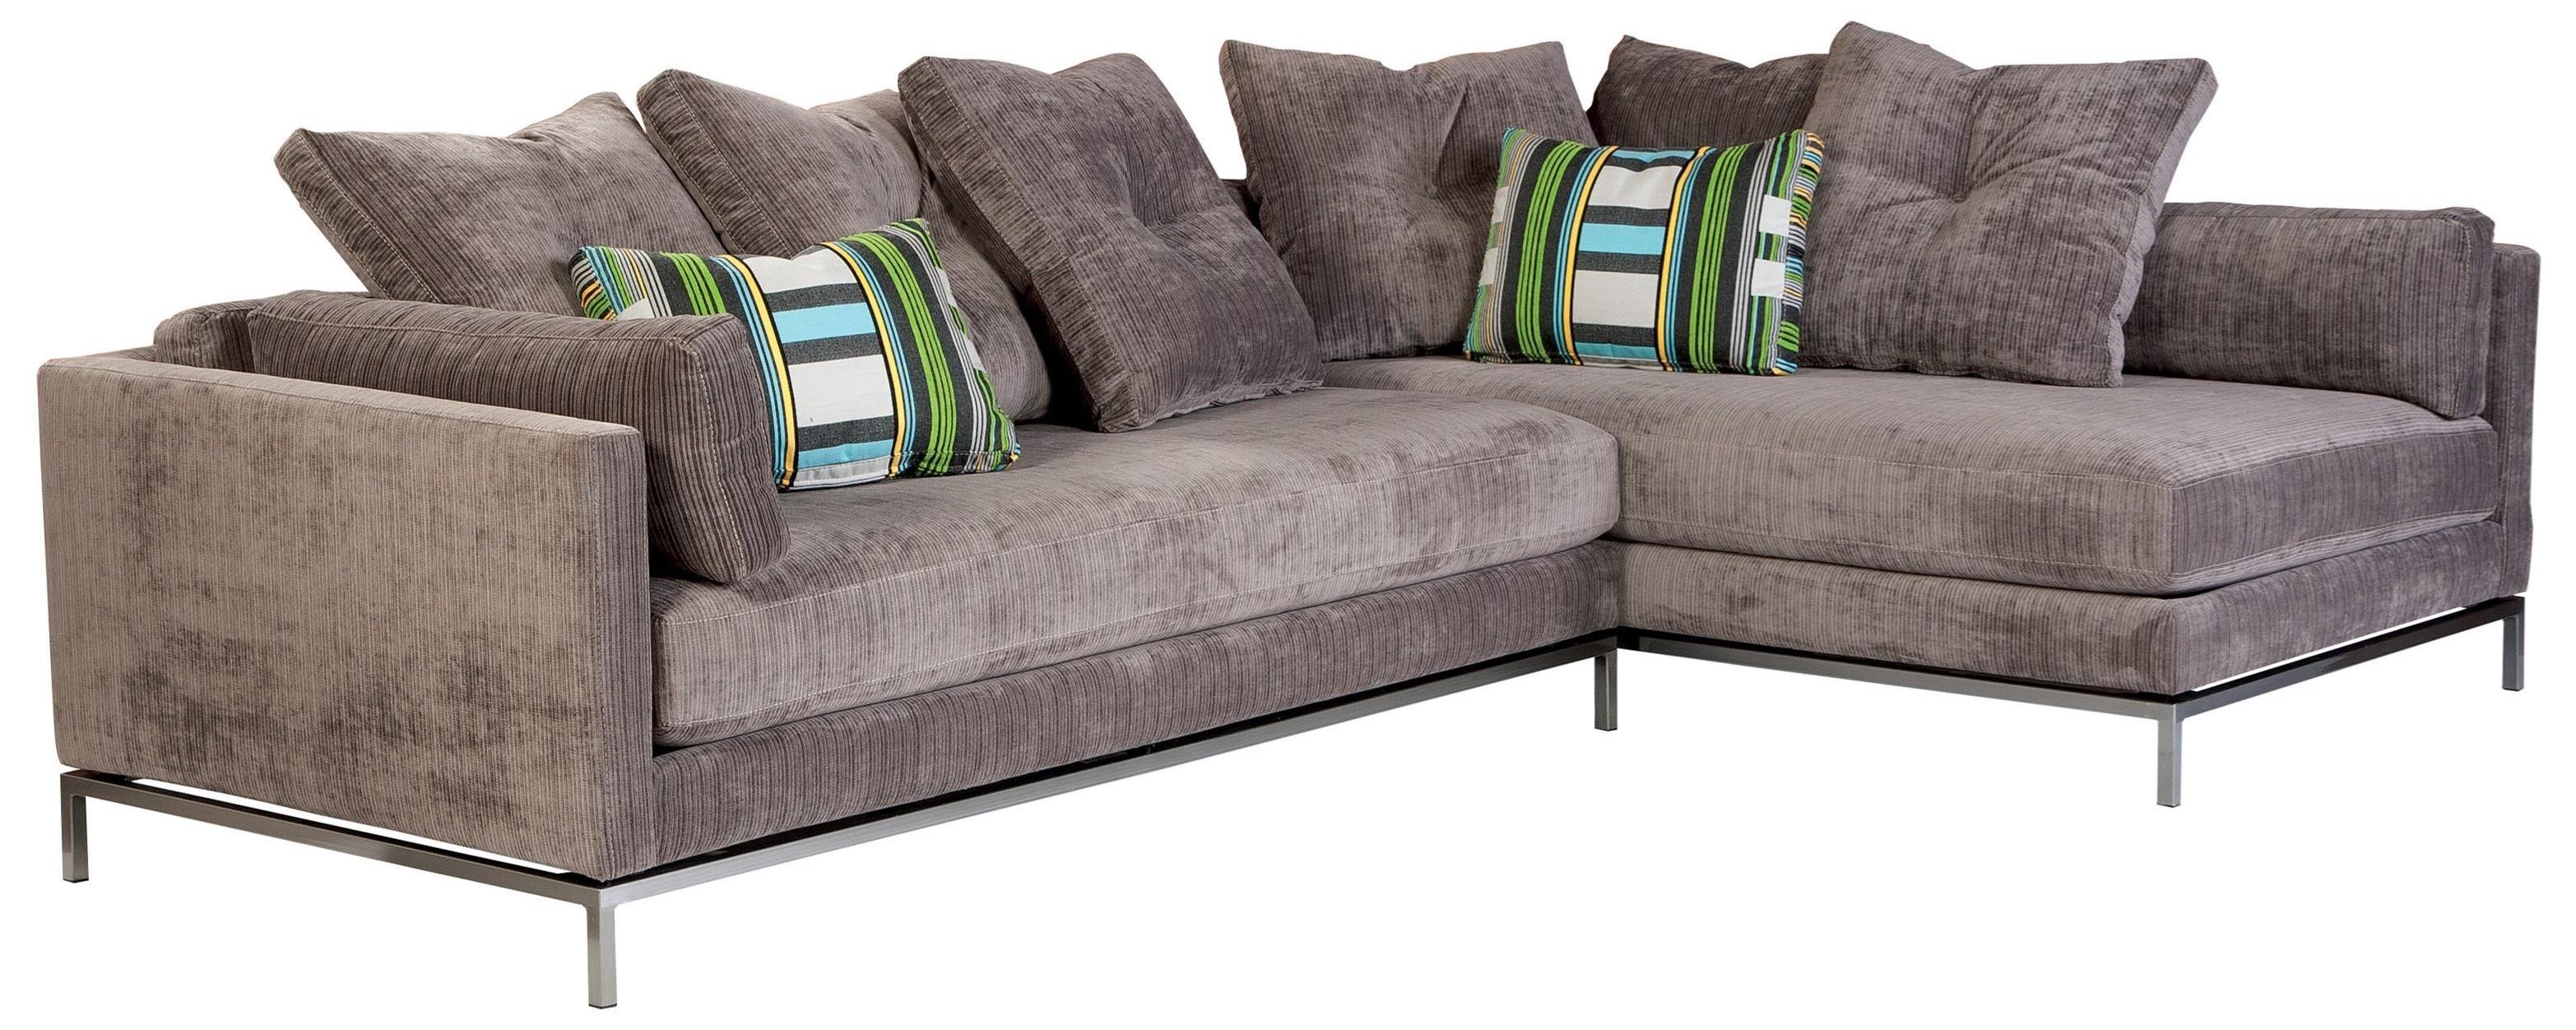 Jonathan Louis Cordoba Contemporary Sectional Sofa With Metal Base